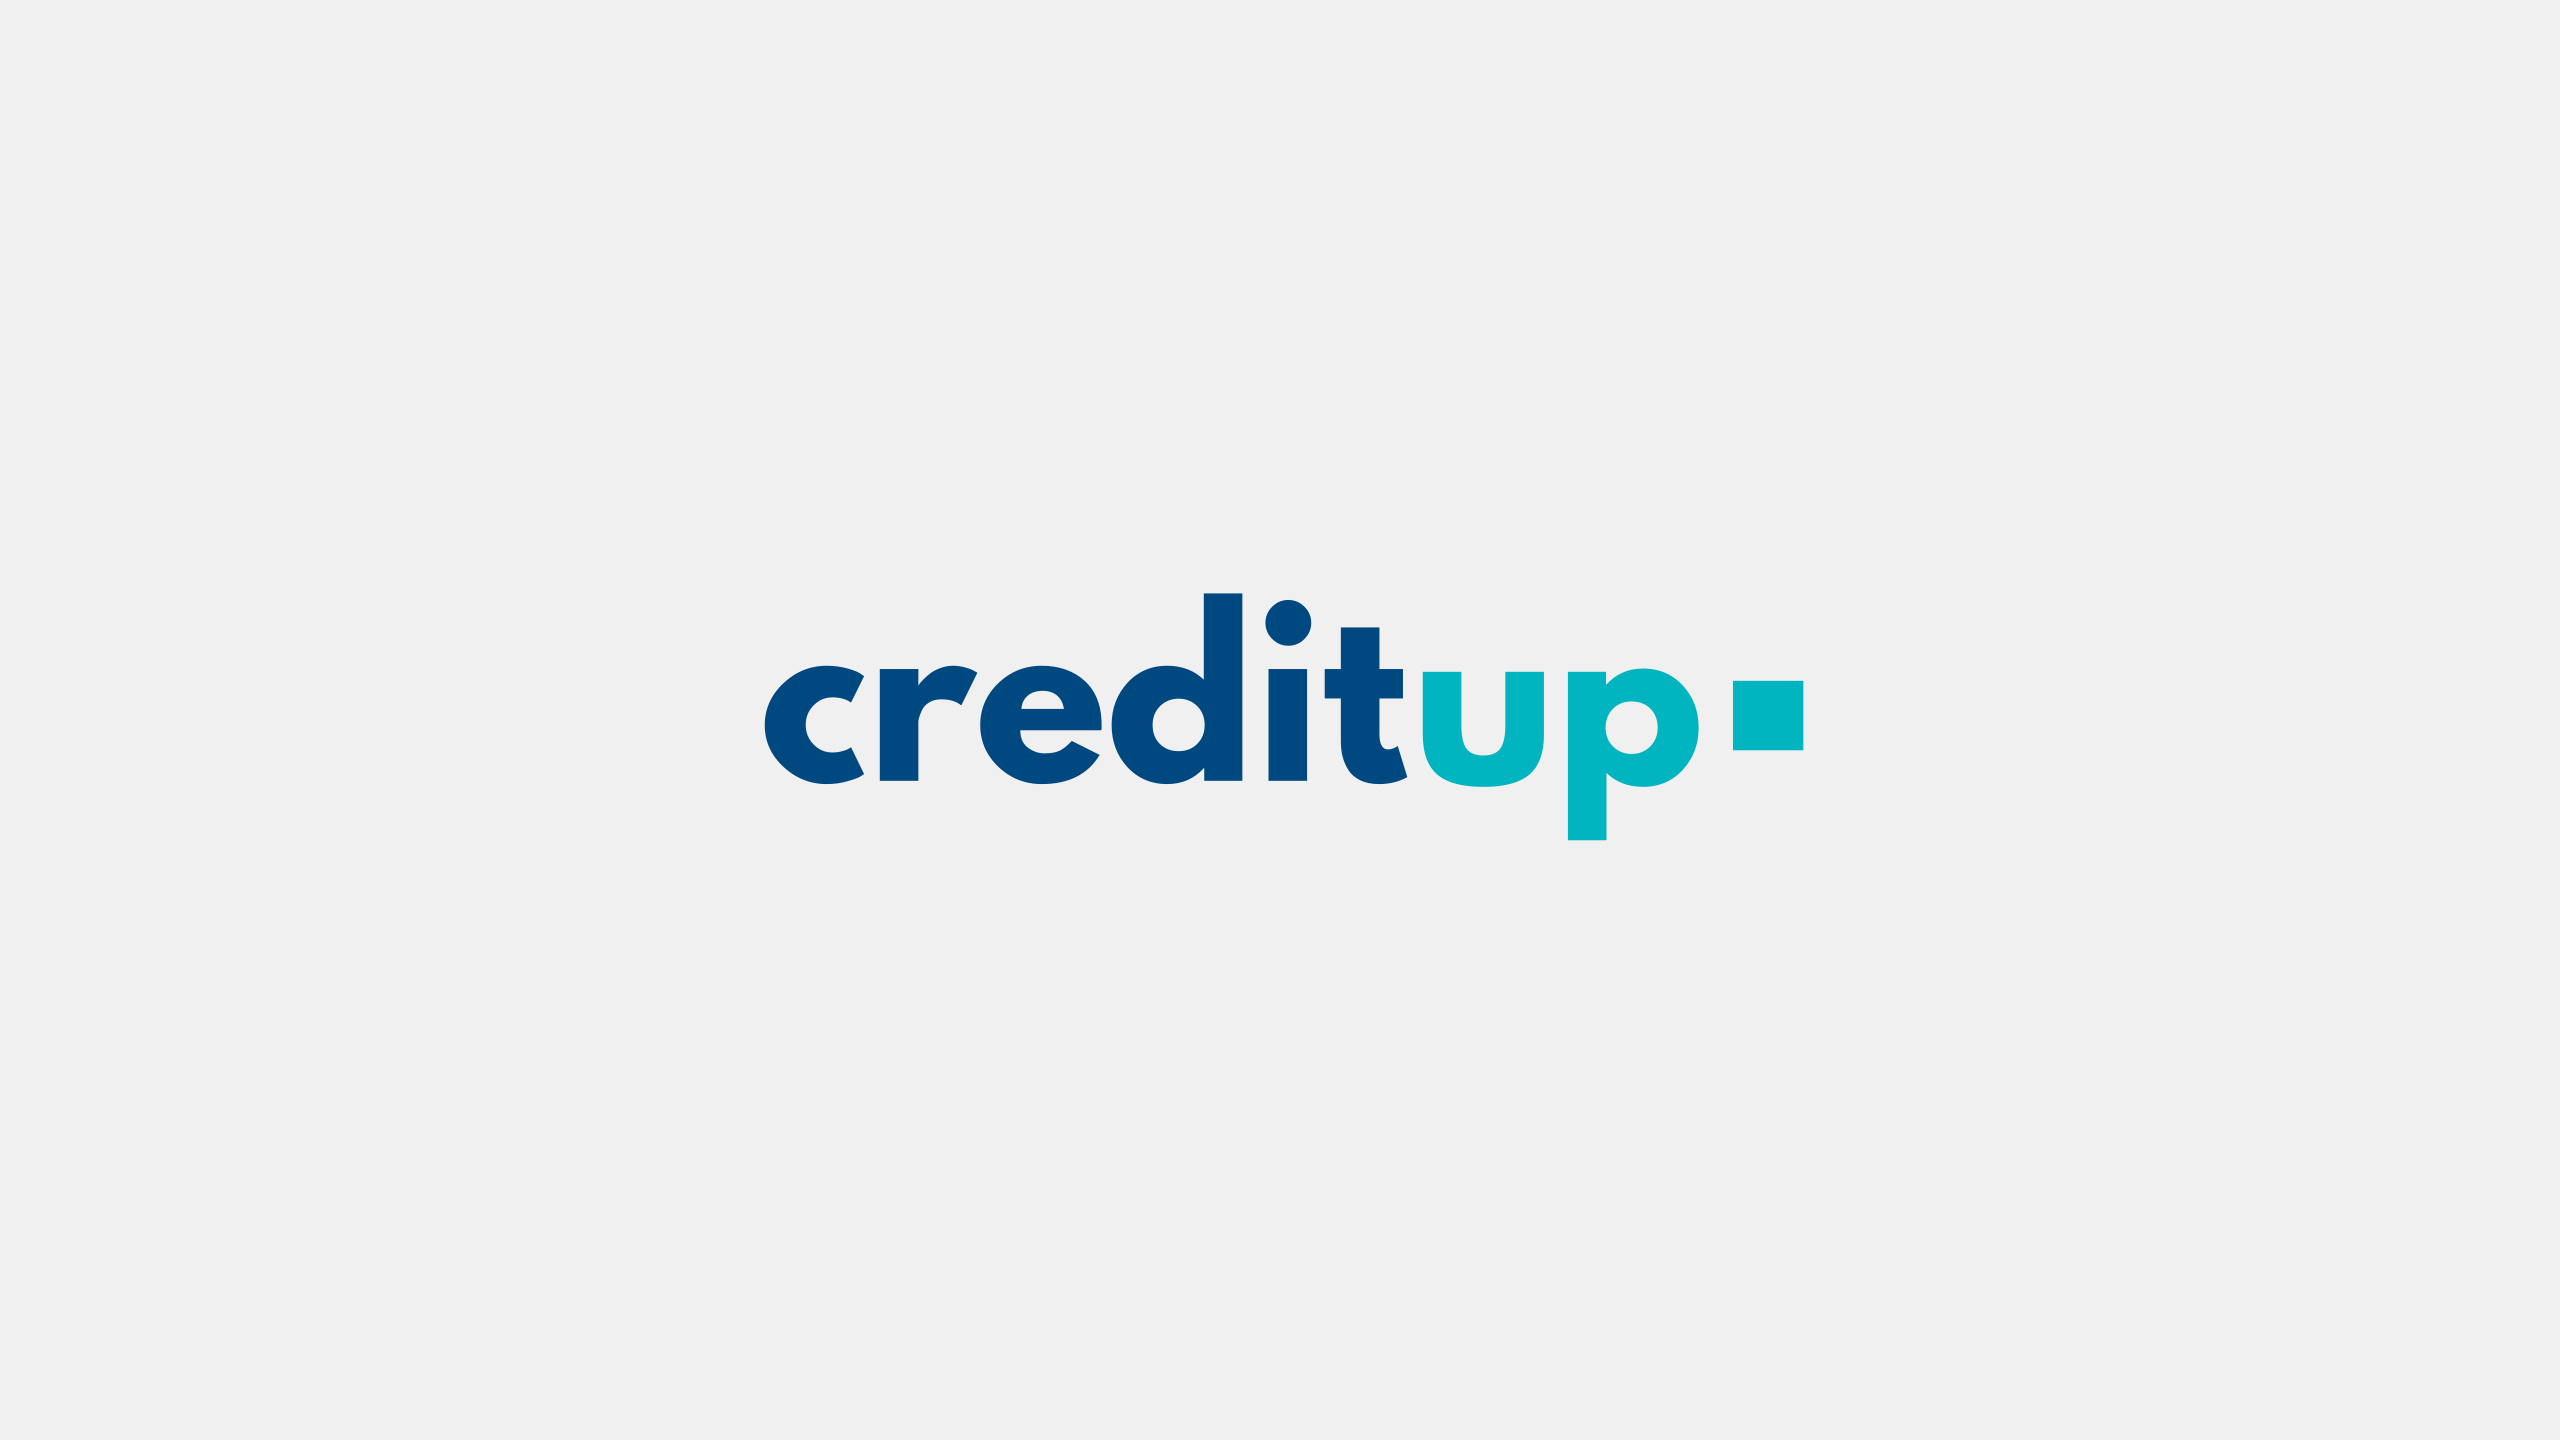 Credit Up 700+ Credit Score Challenge